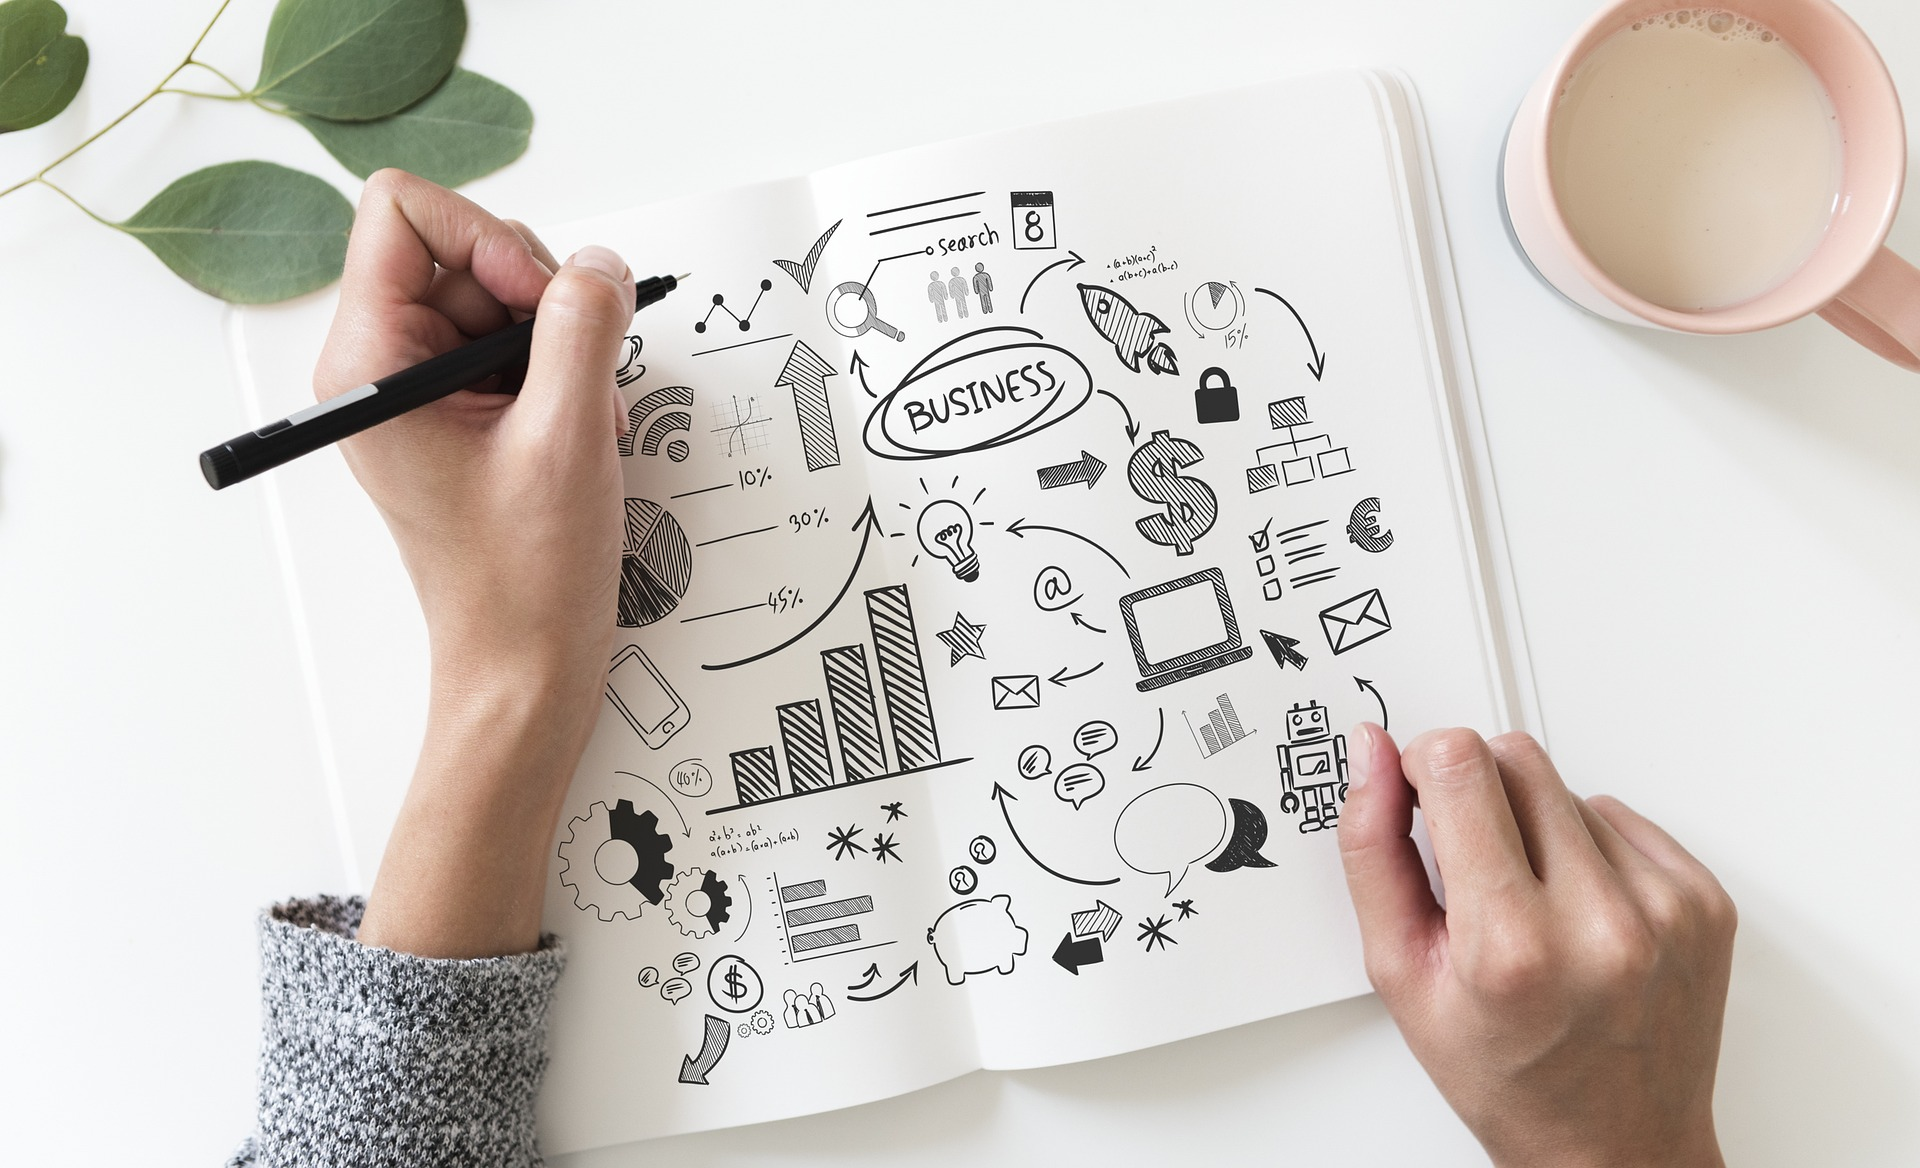 Hvordan laver man den perfekte strategiplan? Få sparring fra førende eksperter i Next Step Challenge